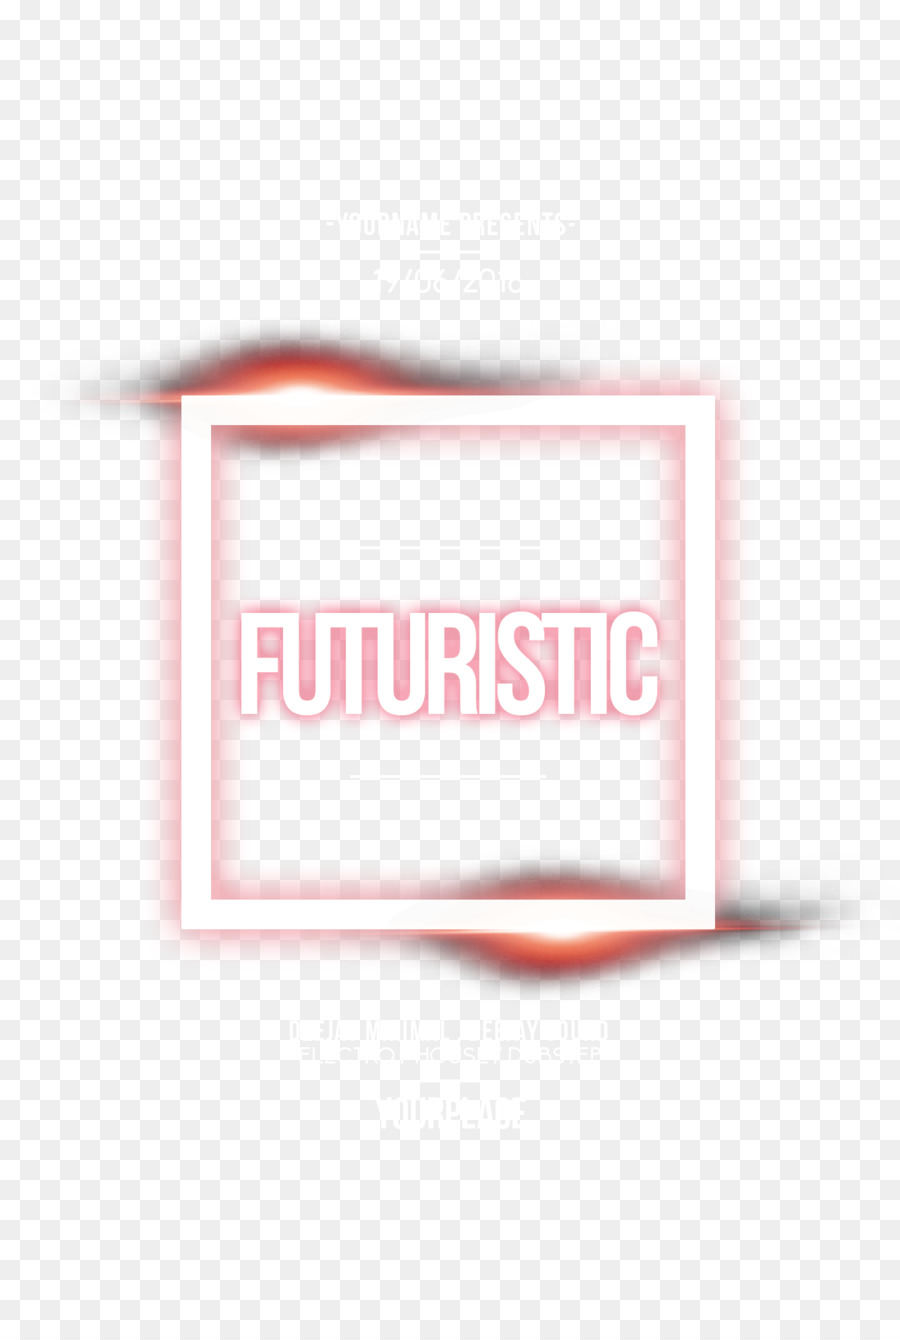 English light emitting poster fonts png download - 1275*1875 - Free